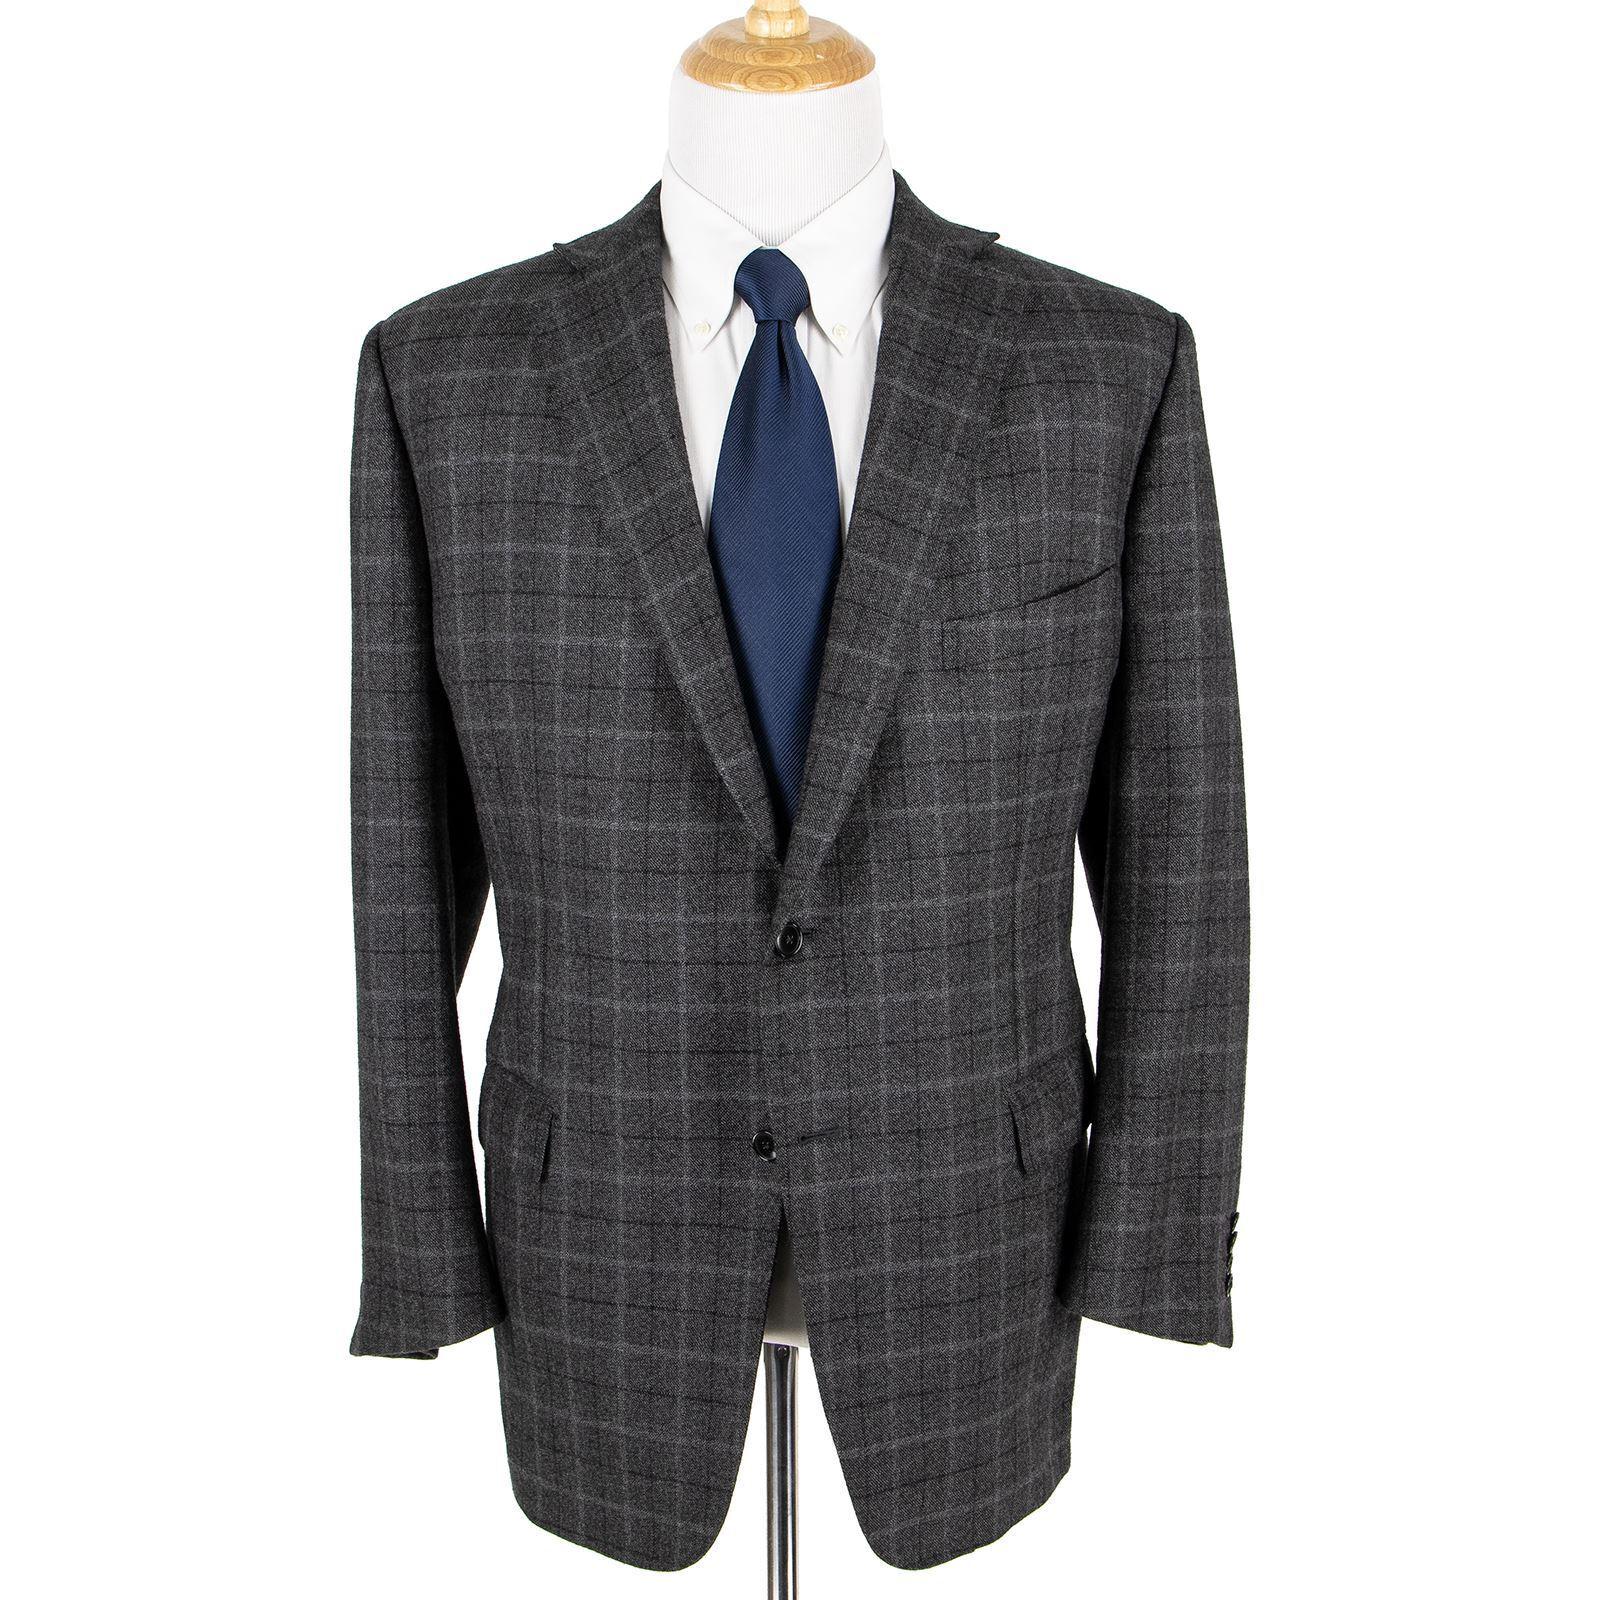 Zegna Su Misura grau Blau Wool Cashmere Plaid Dual Vents 2Btn Jacket 50R